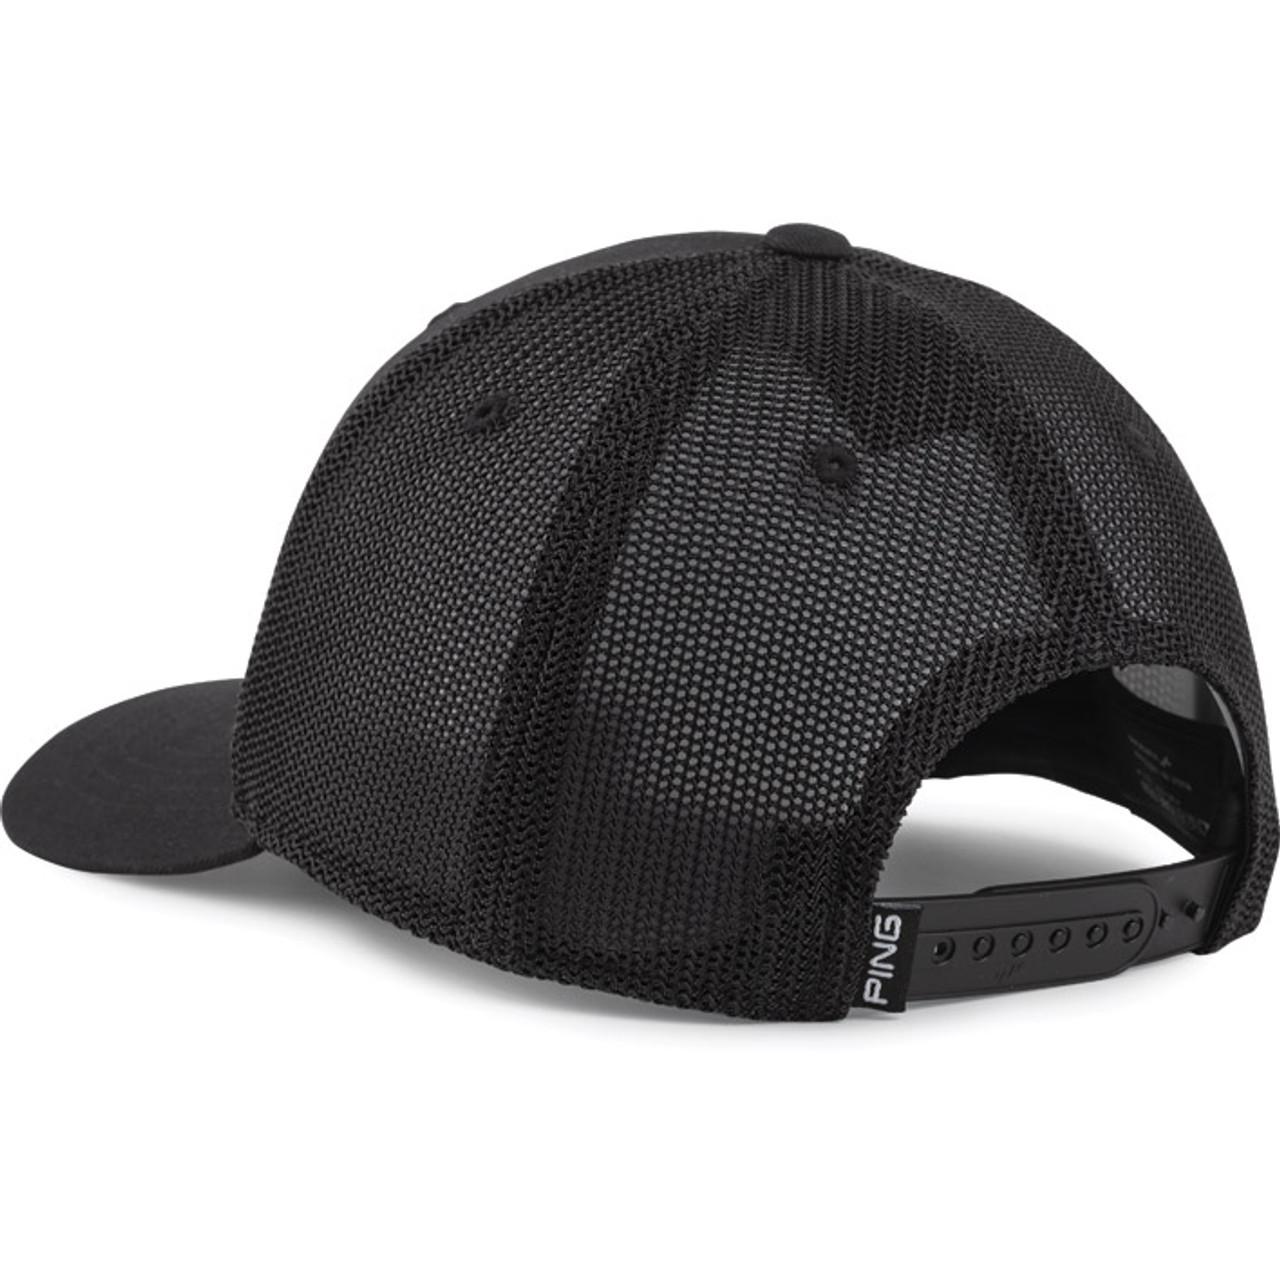 Ping The Bruce Cap - Black